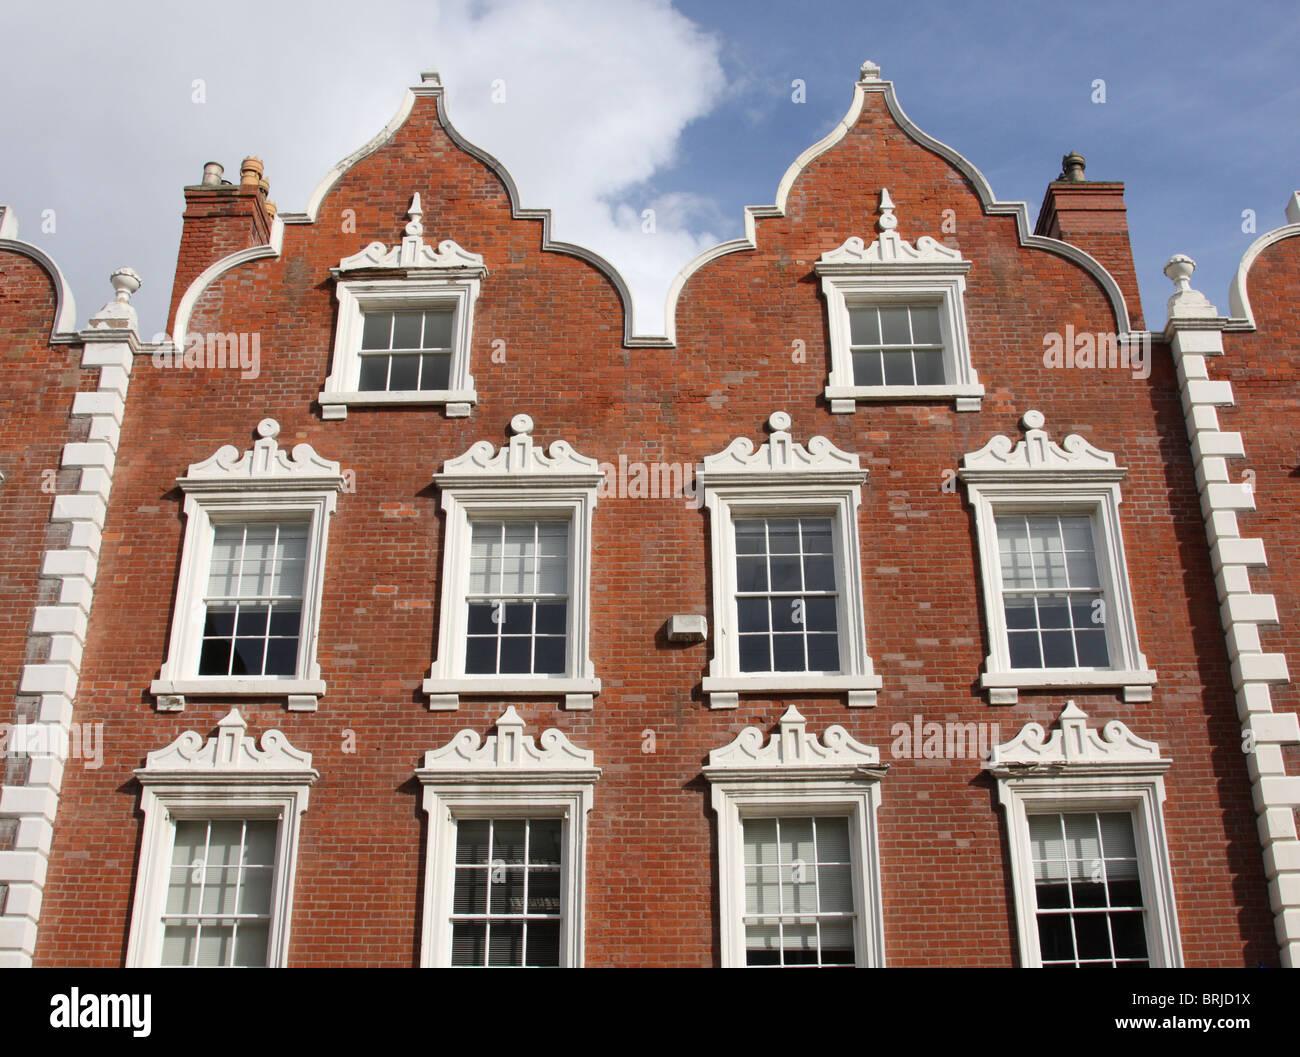 An elegant townhouse exterior. - Stock Image